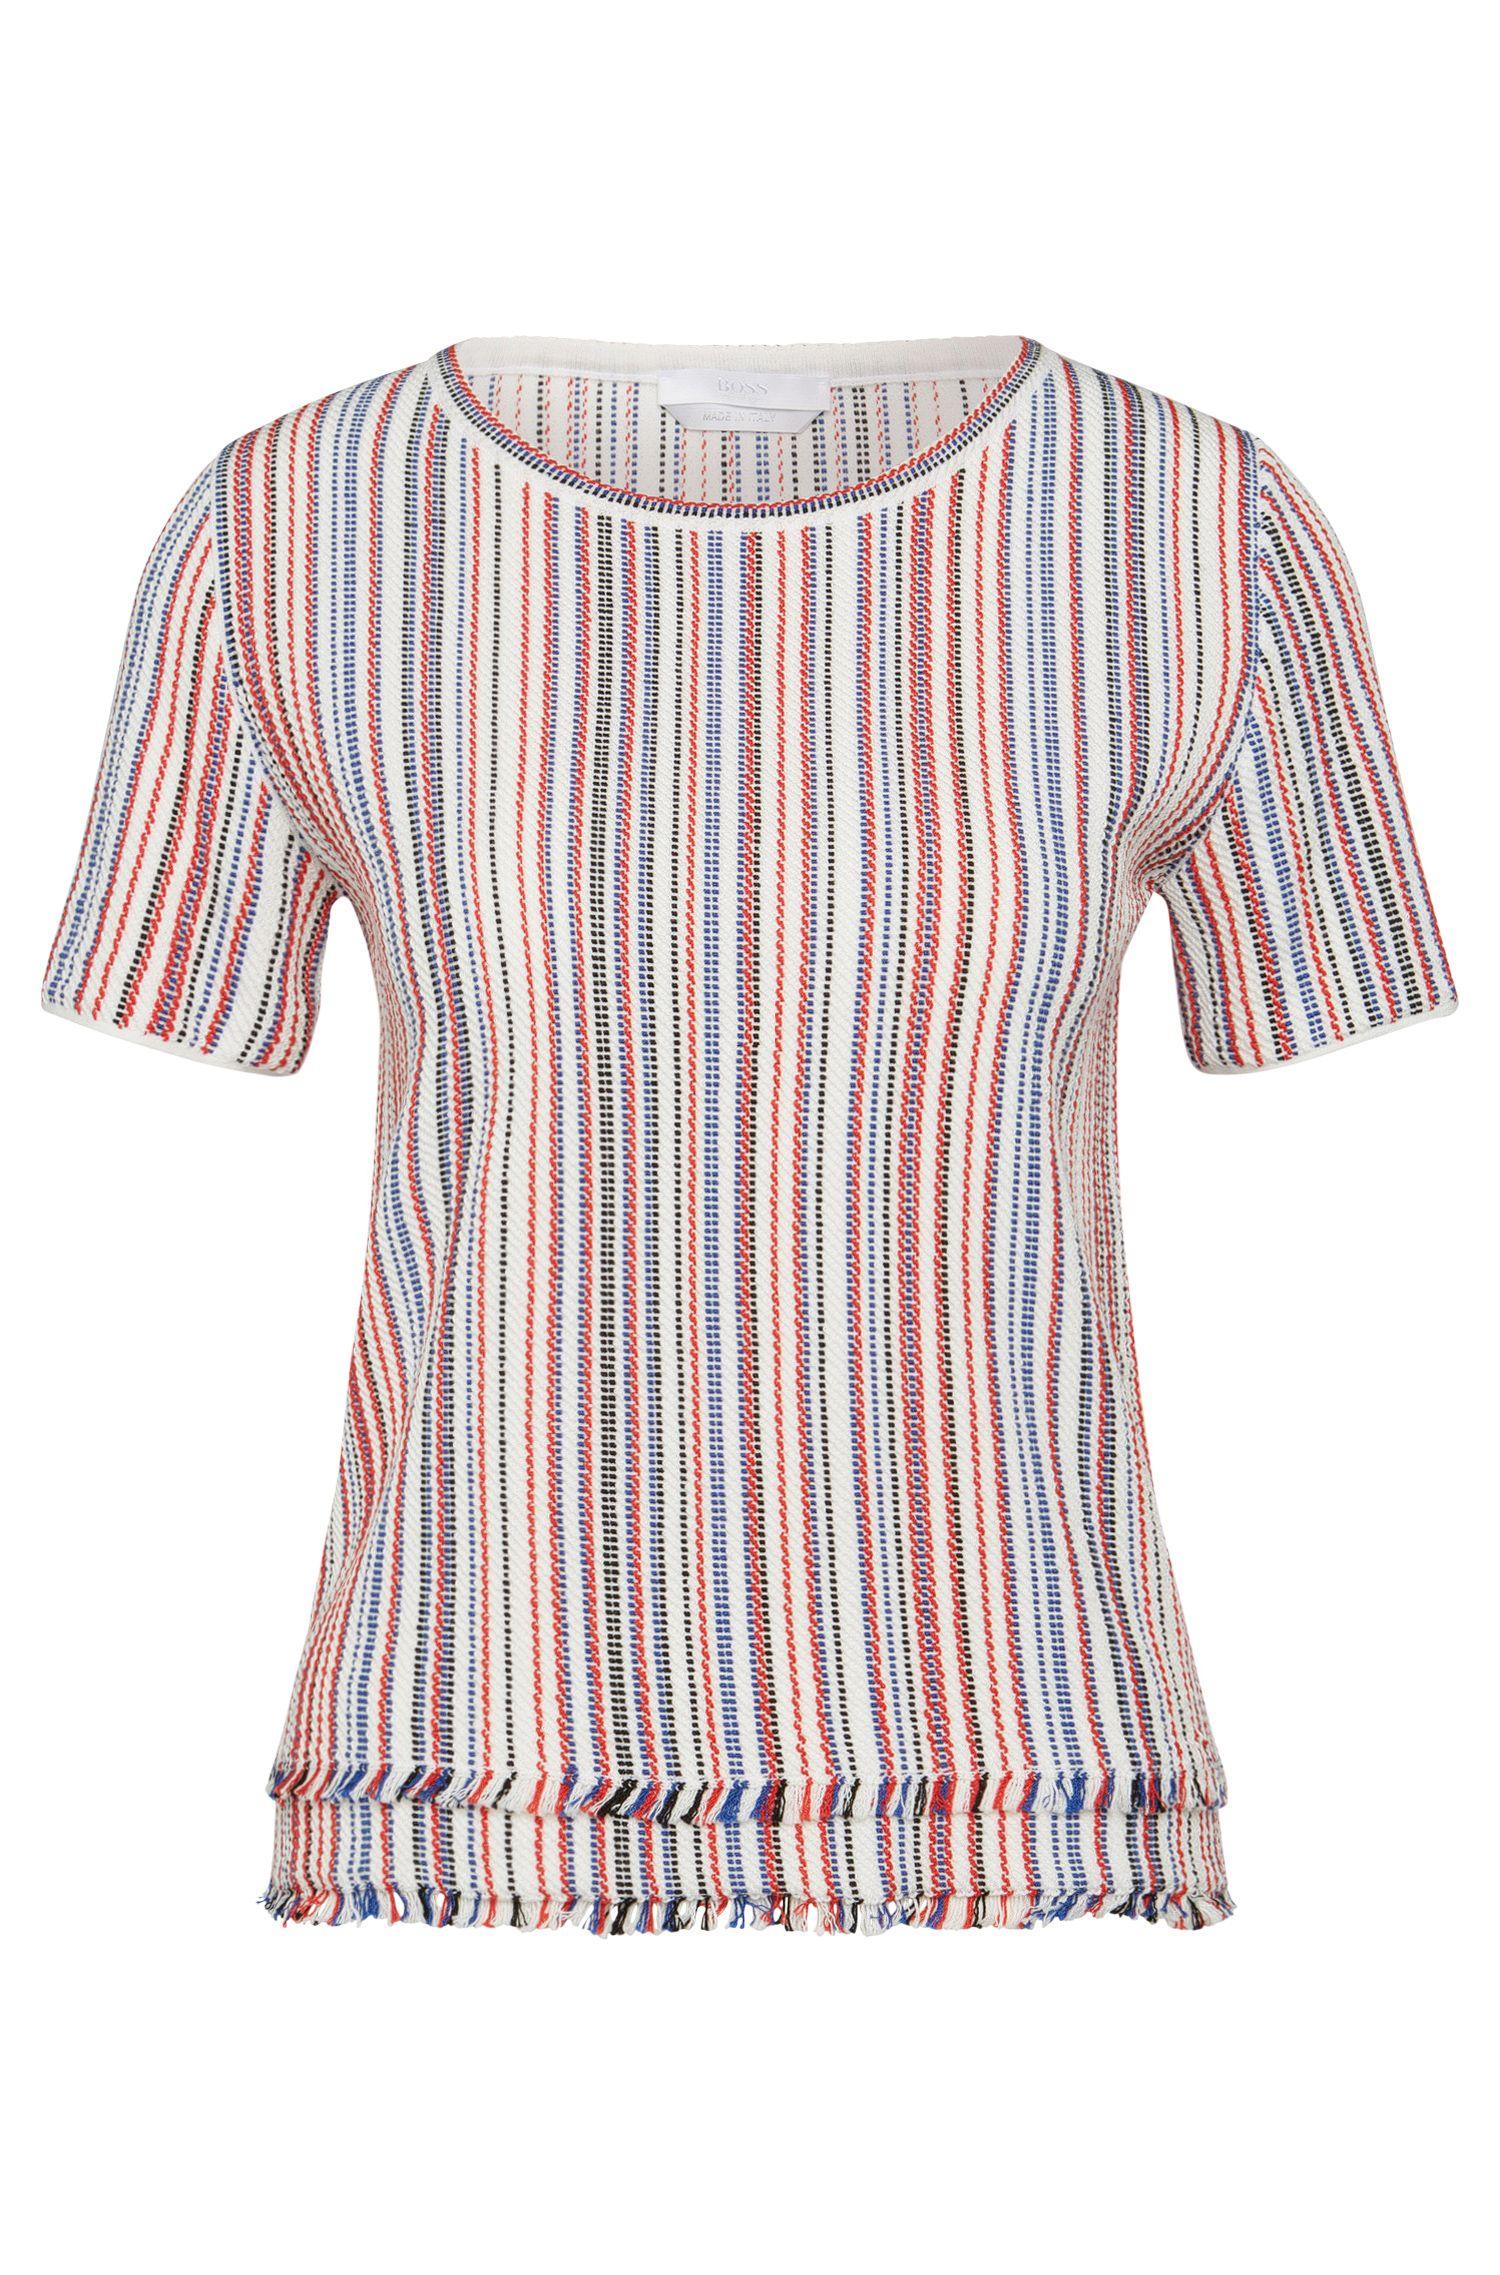 'Fina'   Cotton Blend Multi-Stripe Fringed Blouse